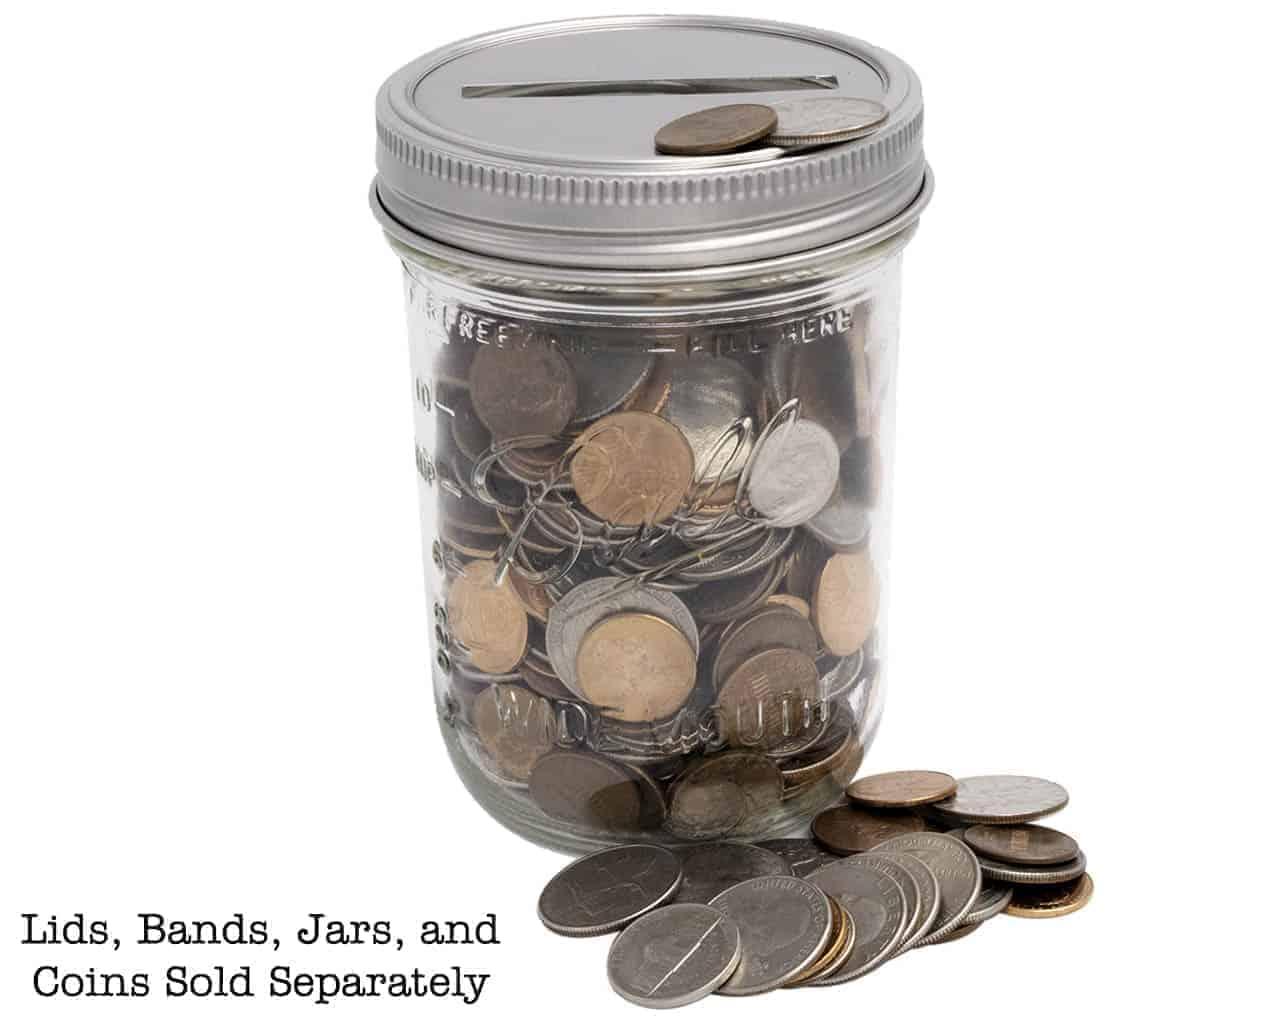 mason-jar-lifestyle-stainless-steel-coin-slot-bank-lid-insert-band-wide-mouth-pint-ball-mason-jar-money